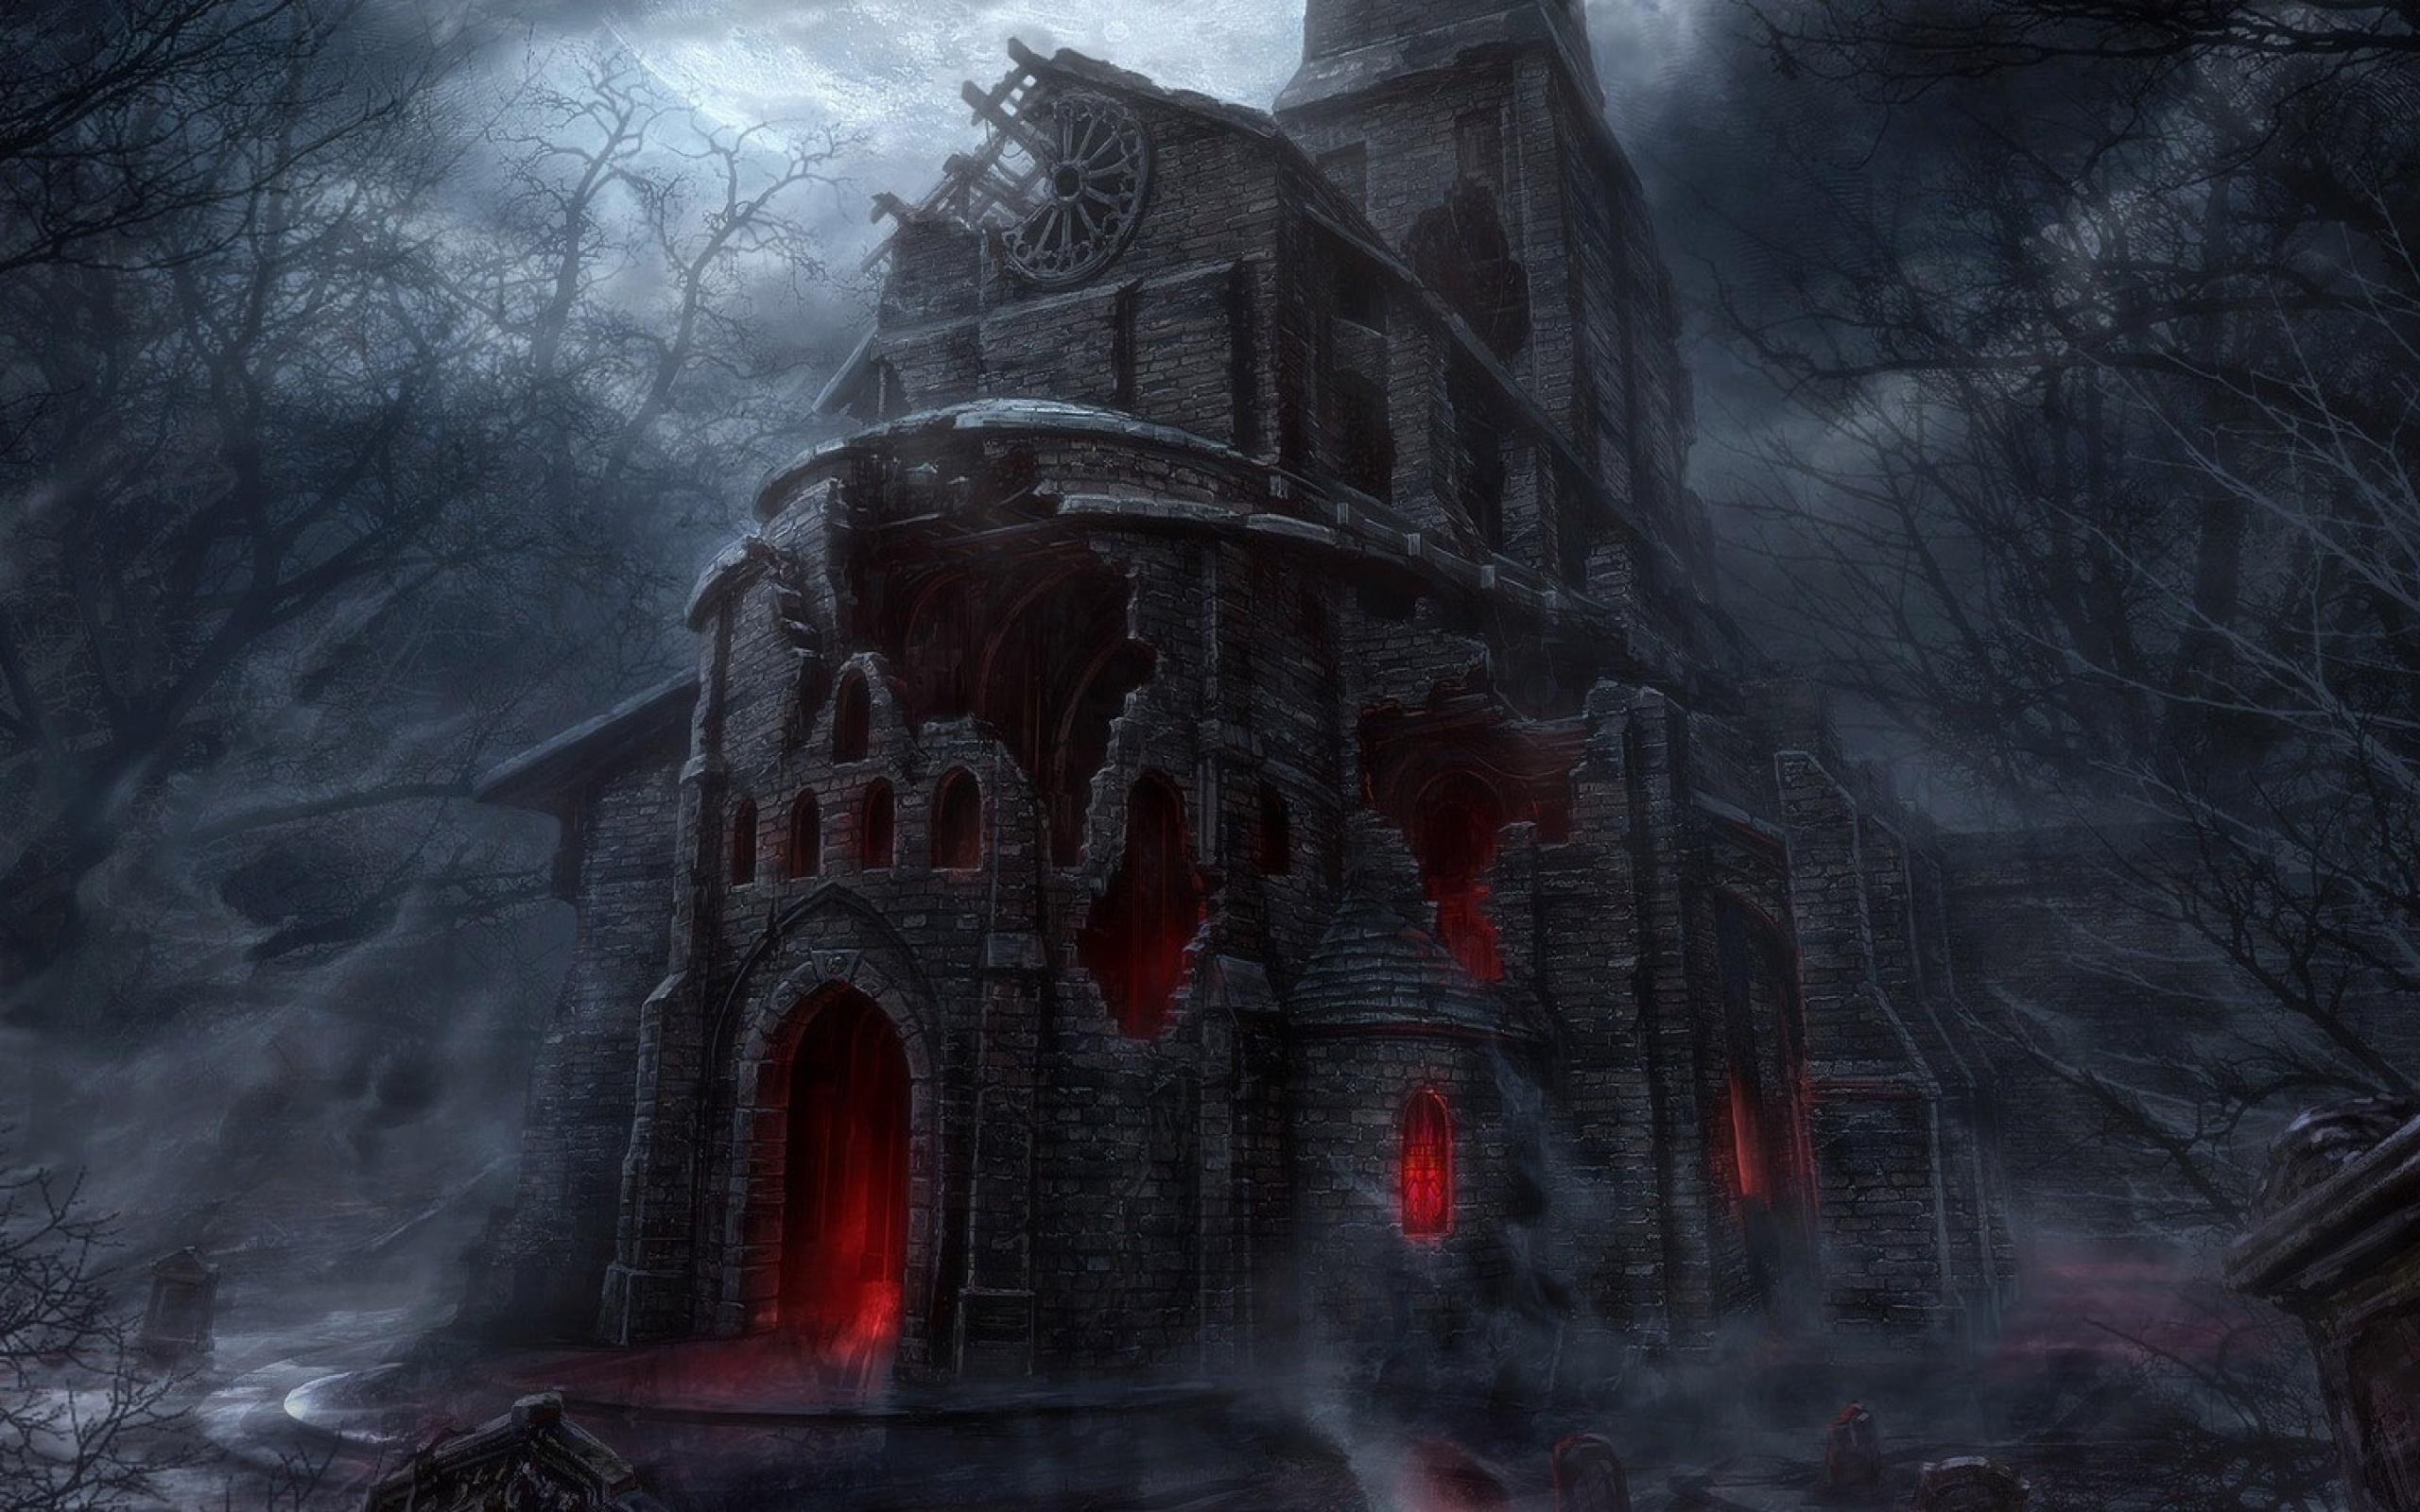 halloween_artwork_mansion-dusicky-obrazky-na-plochu